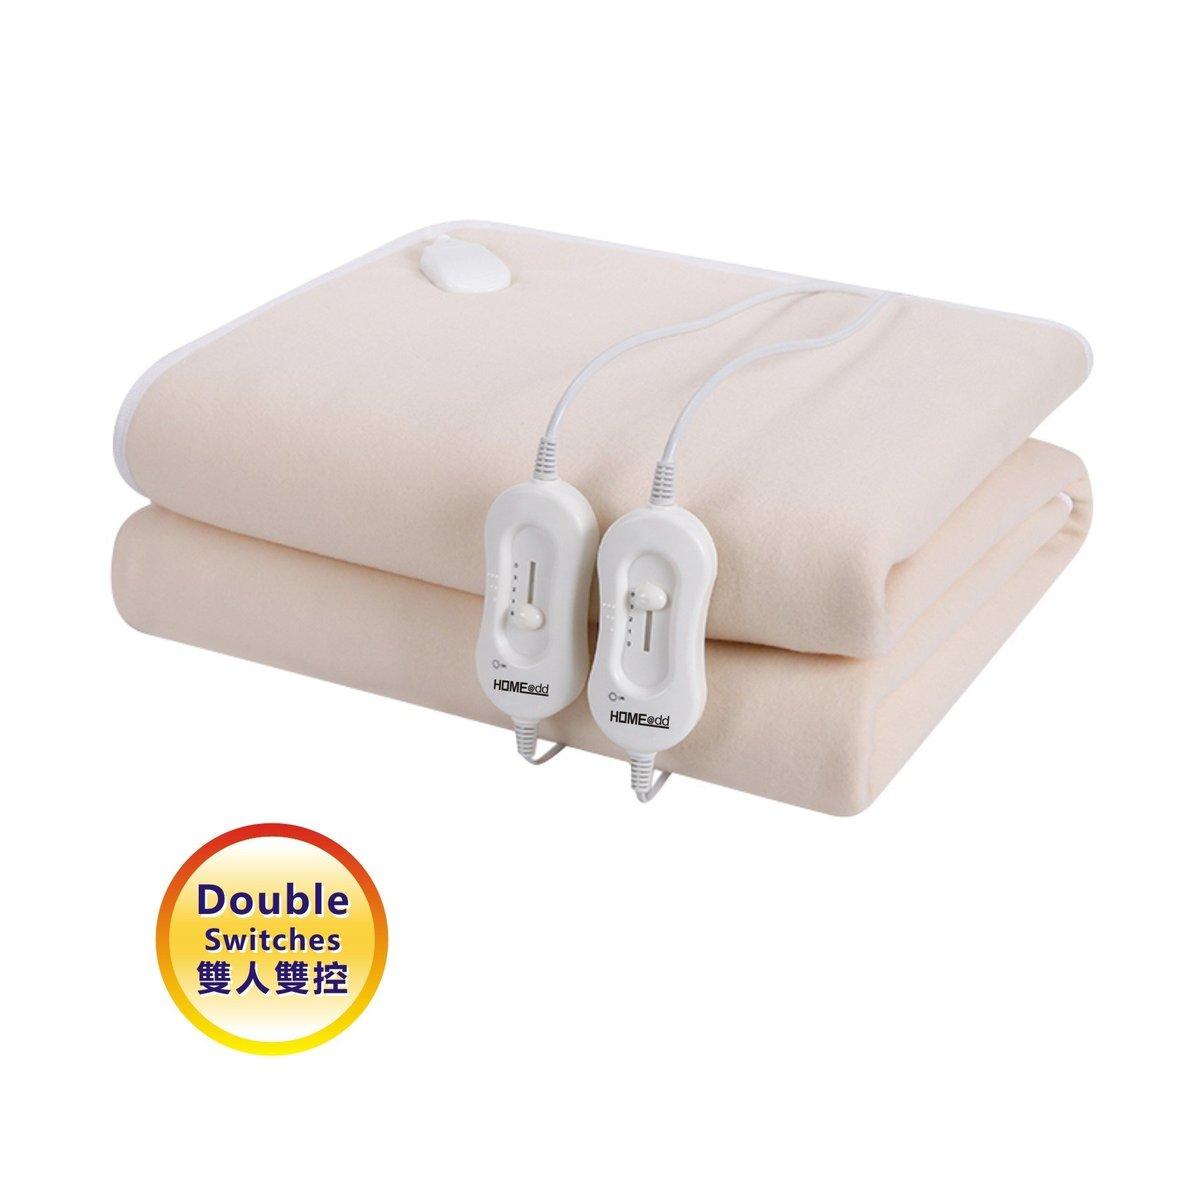 Double Polar Fleece Electric Blanket